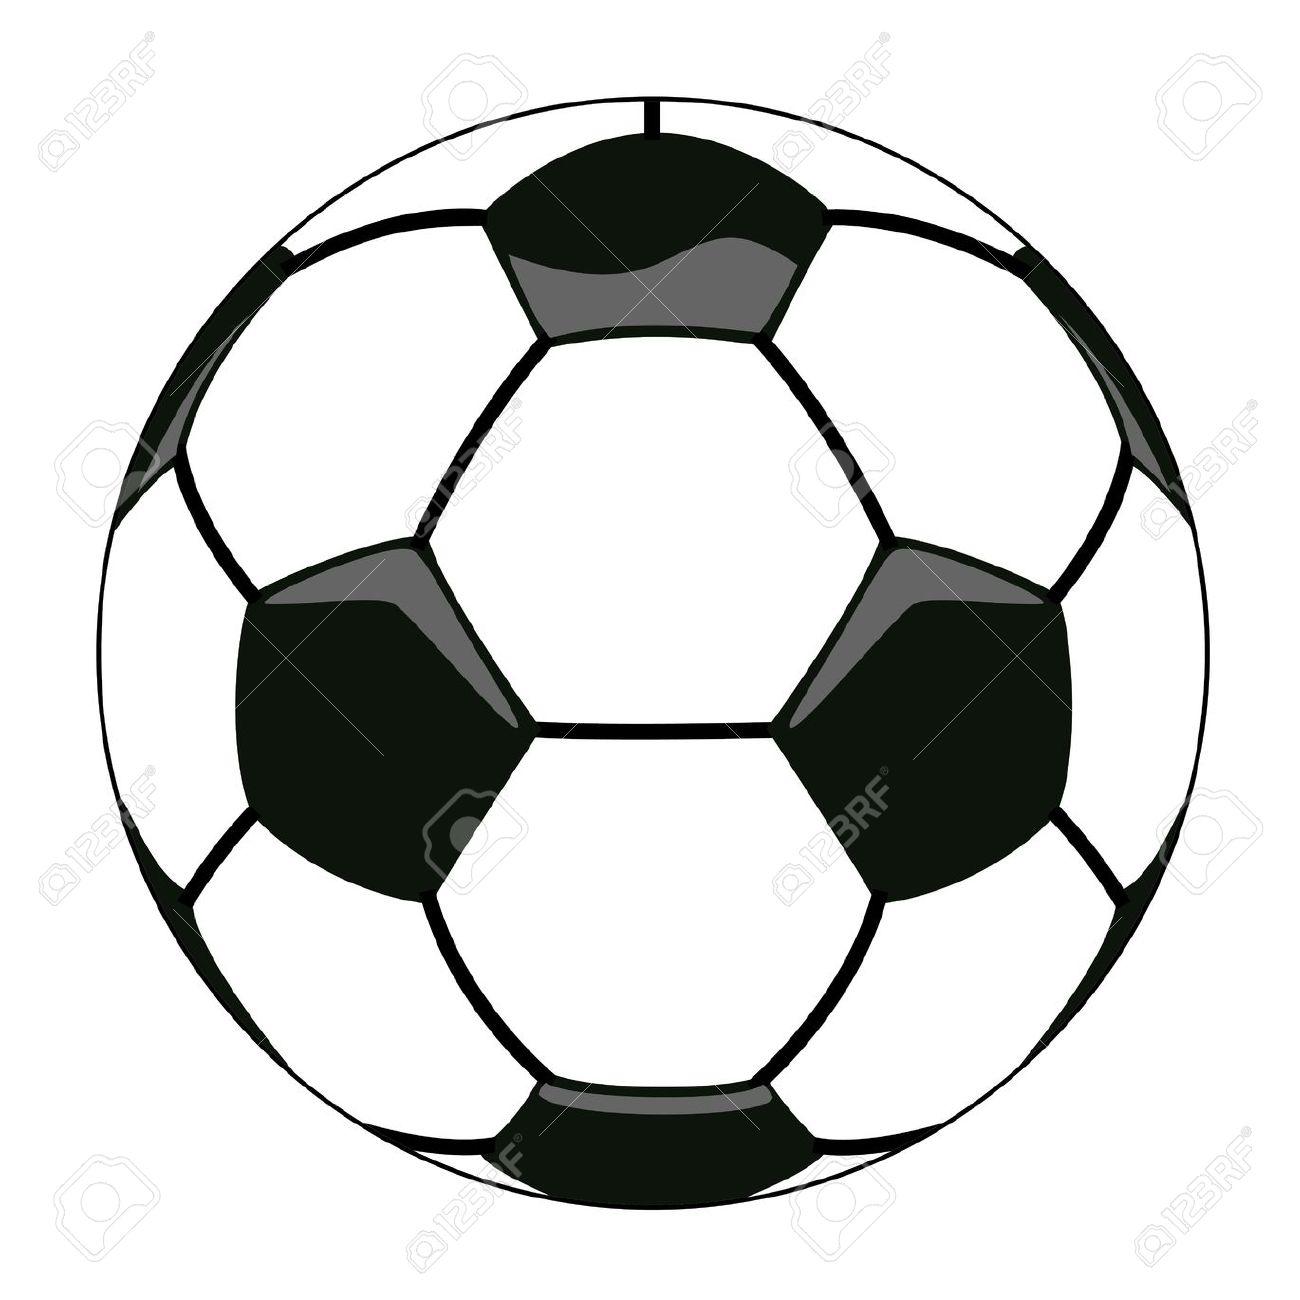 Soccer ball clipart vector clip art Vector Illustration Of Soccer Ball Clipart Royalty Free Cliparts ... clip art